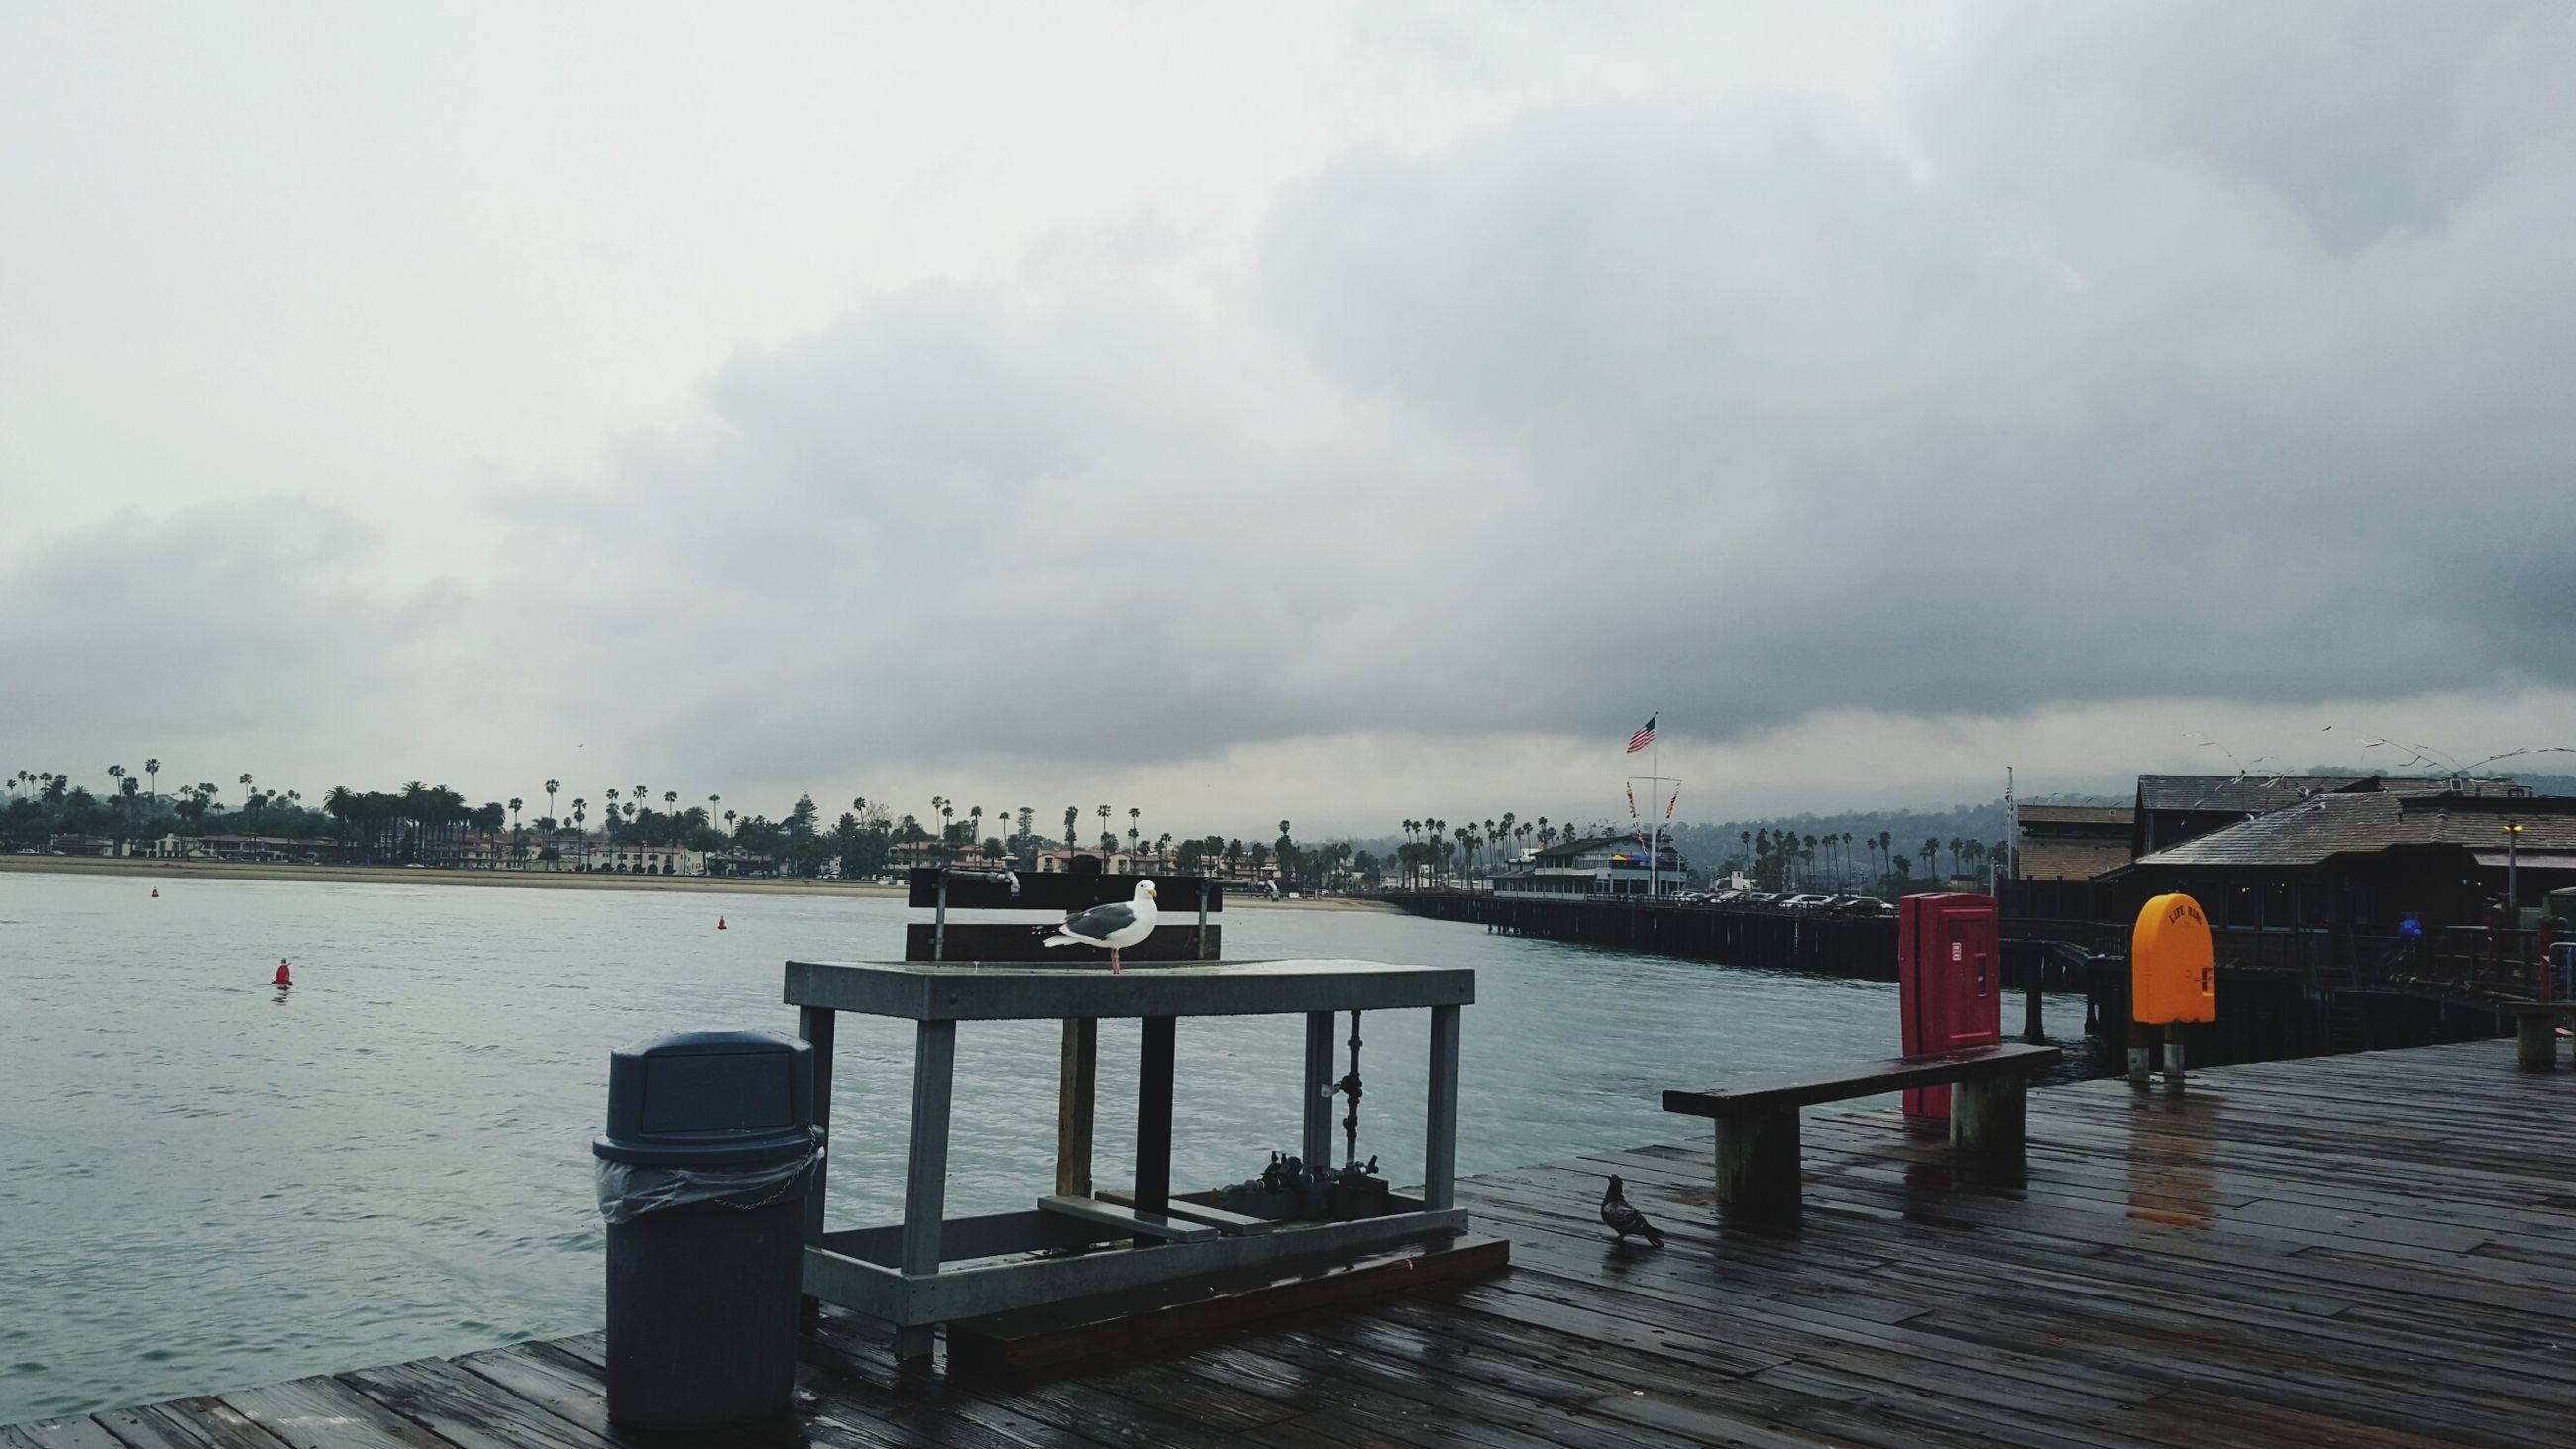 water, sky, cloud - sky, built structure, sea, cloudy, architecture, building exterior, weather, railing, pier, nautical vessel, overcast, outdoors, transportation, river, cloud, city, harbor, day